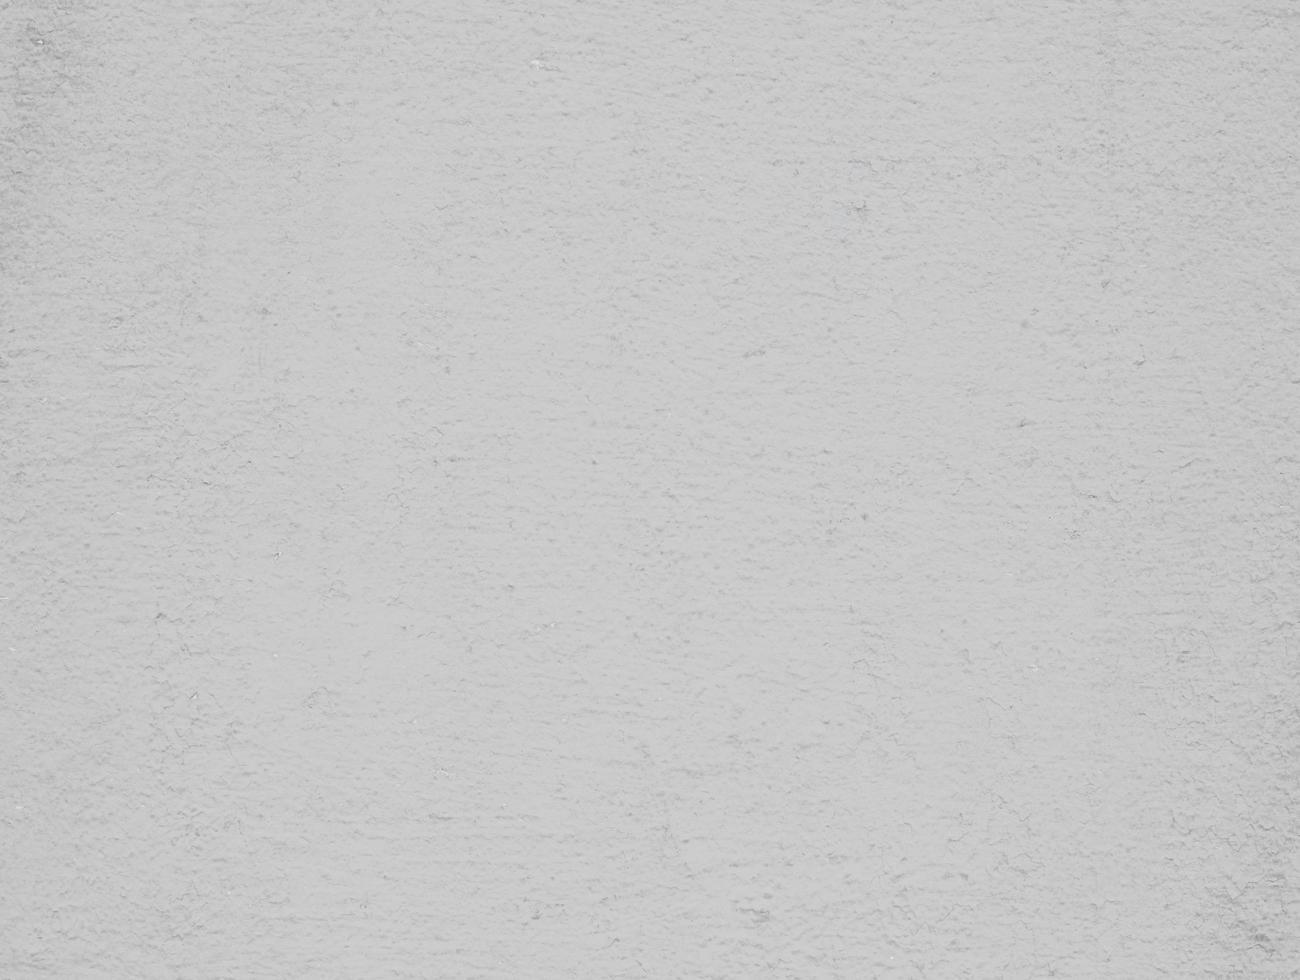 Grey concrete wall texture photo